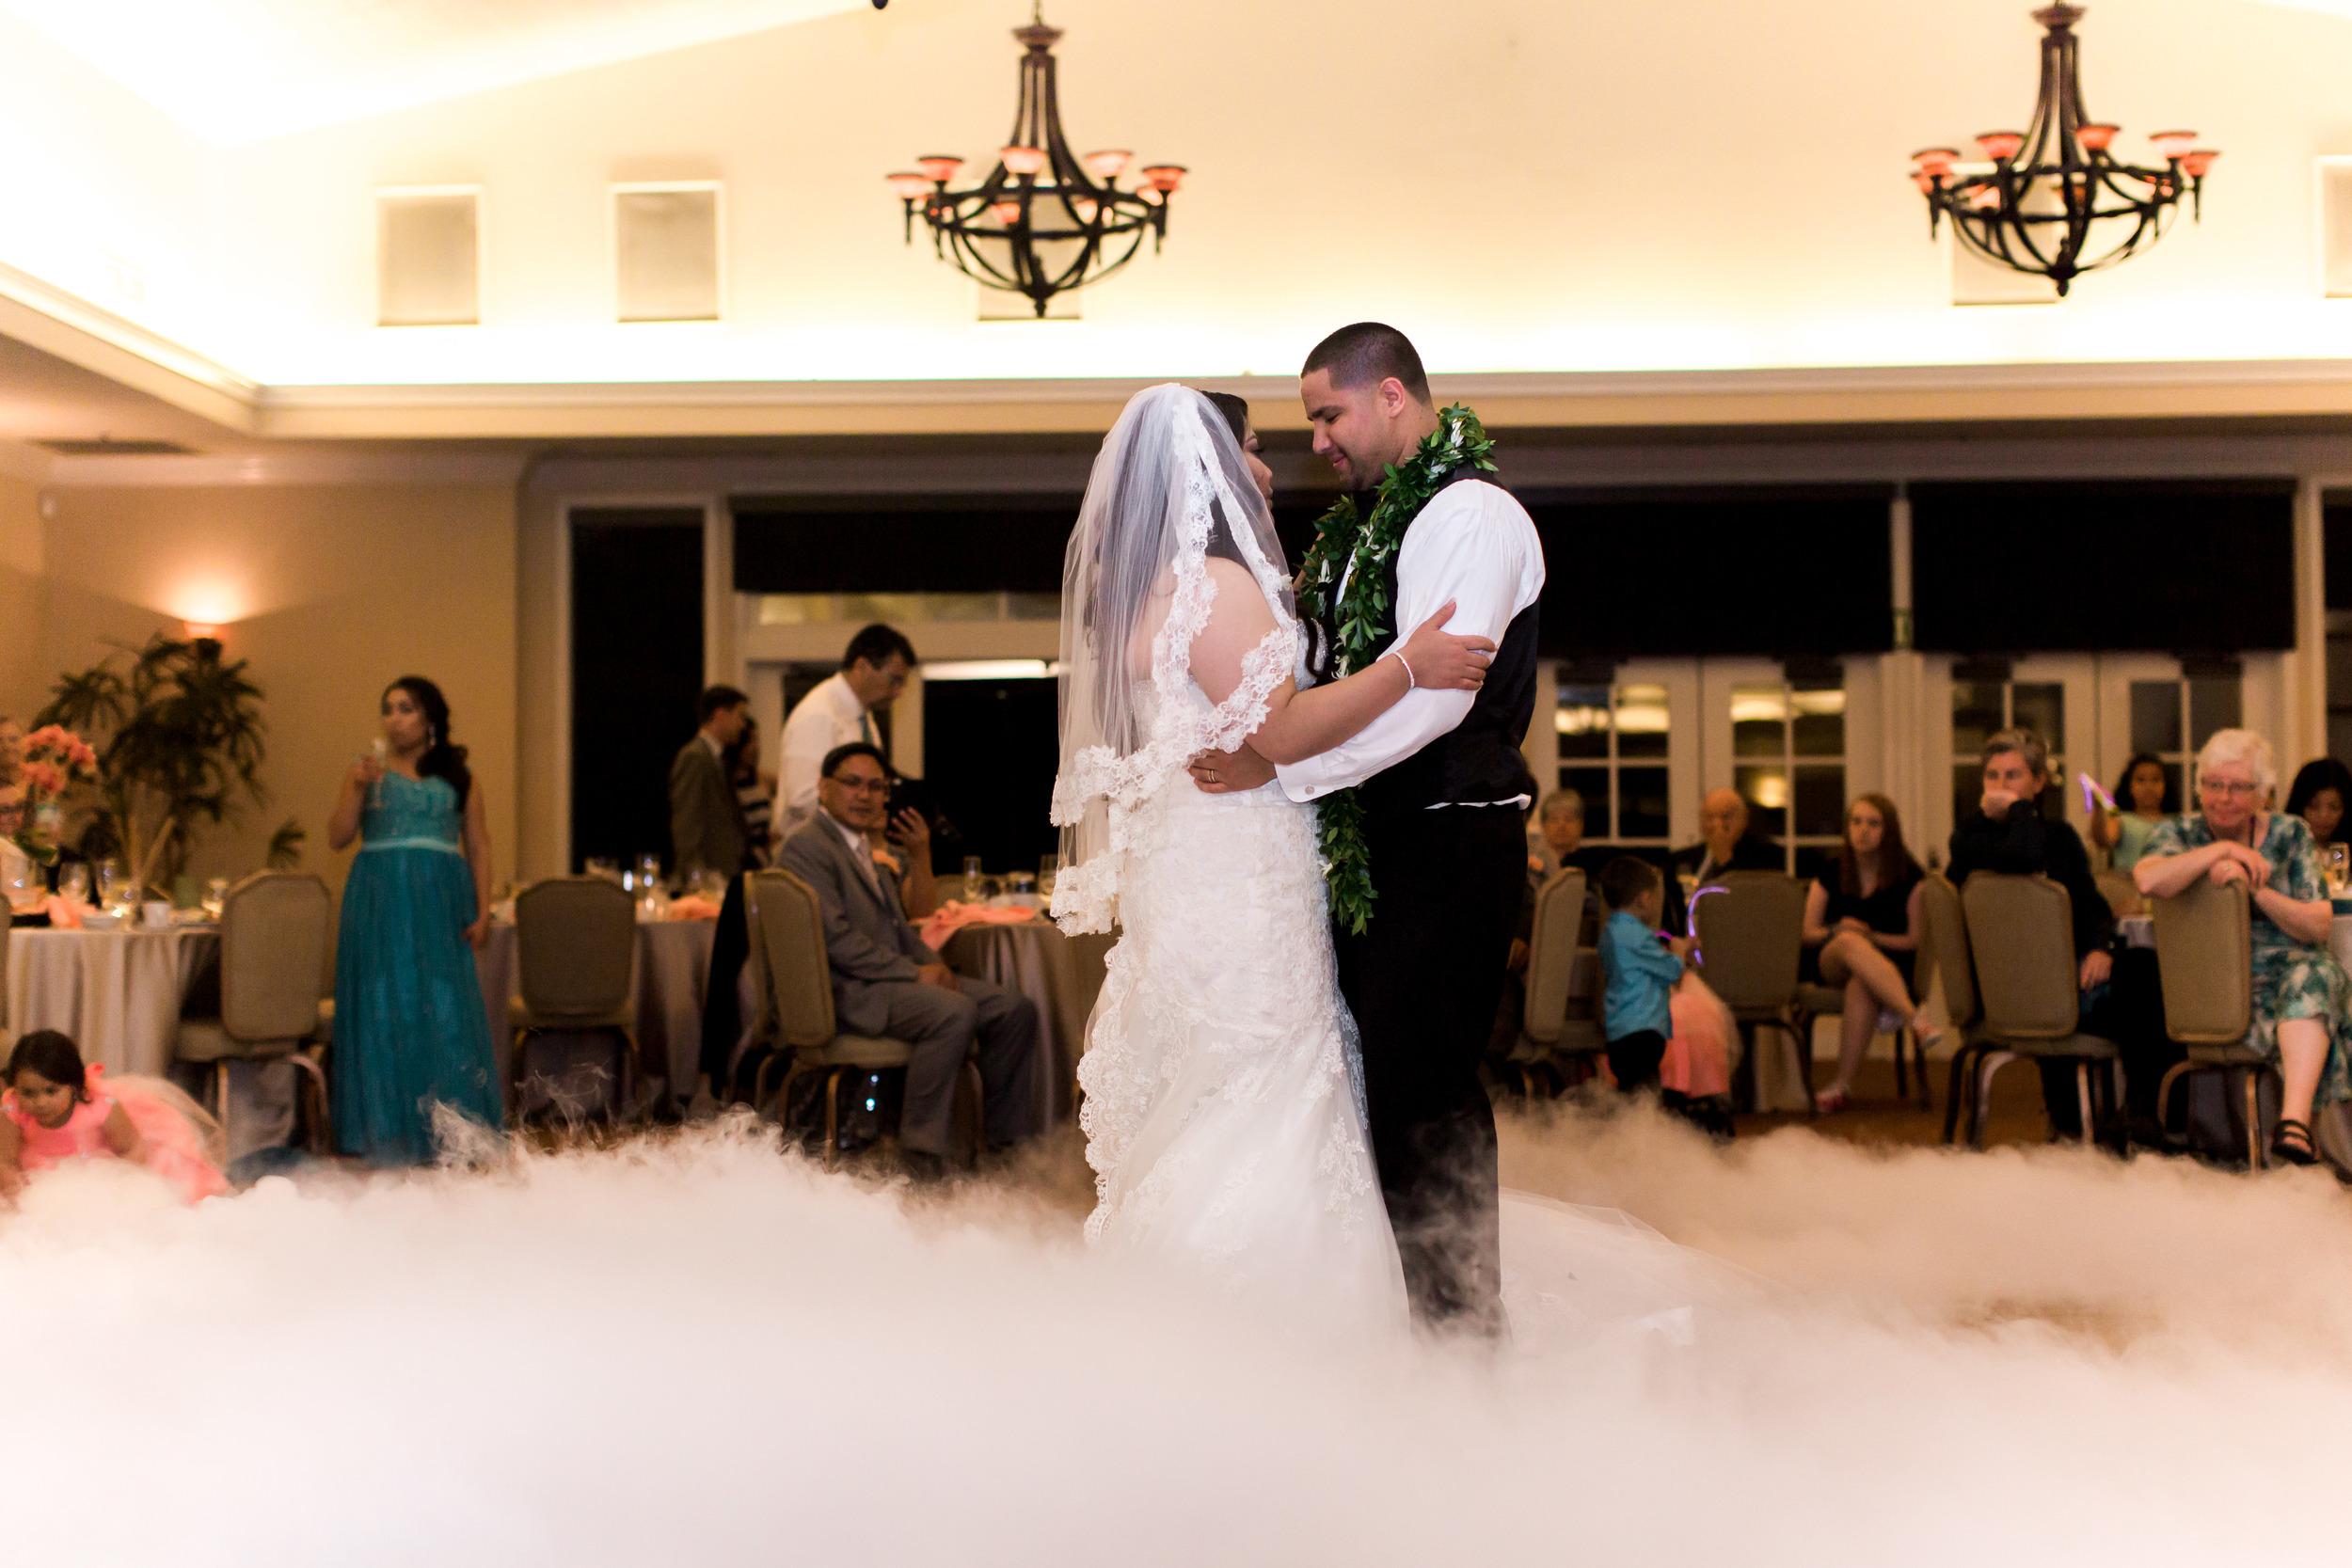 hawaiian-inspired-wedding-at-blackhawk-country-club-3557.jpg